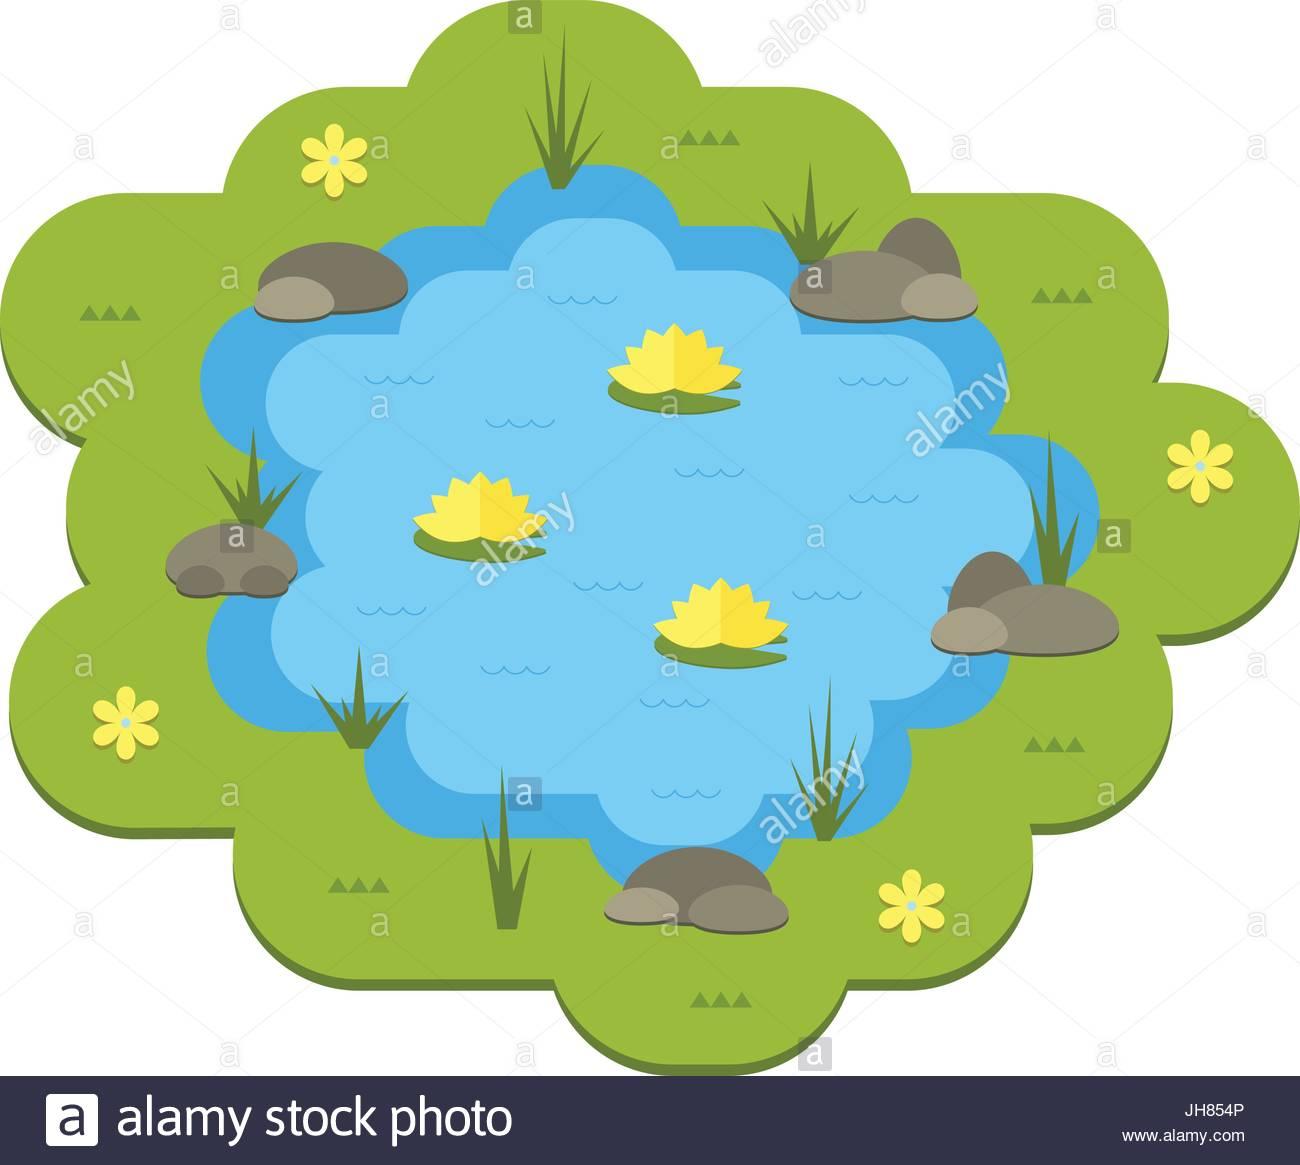 1300x1165 Cartoon Vector Garden Pond Illustration With Water, Plants